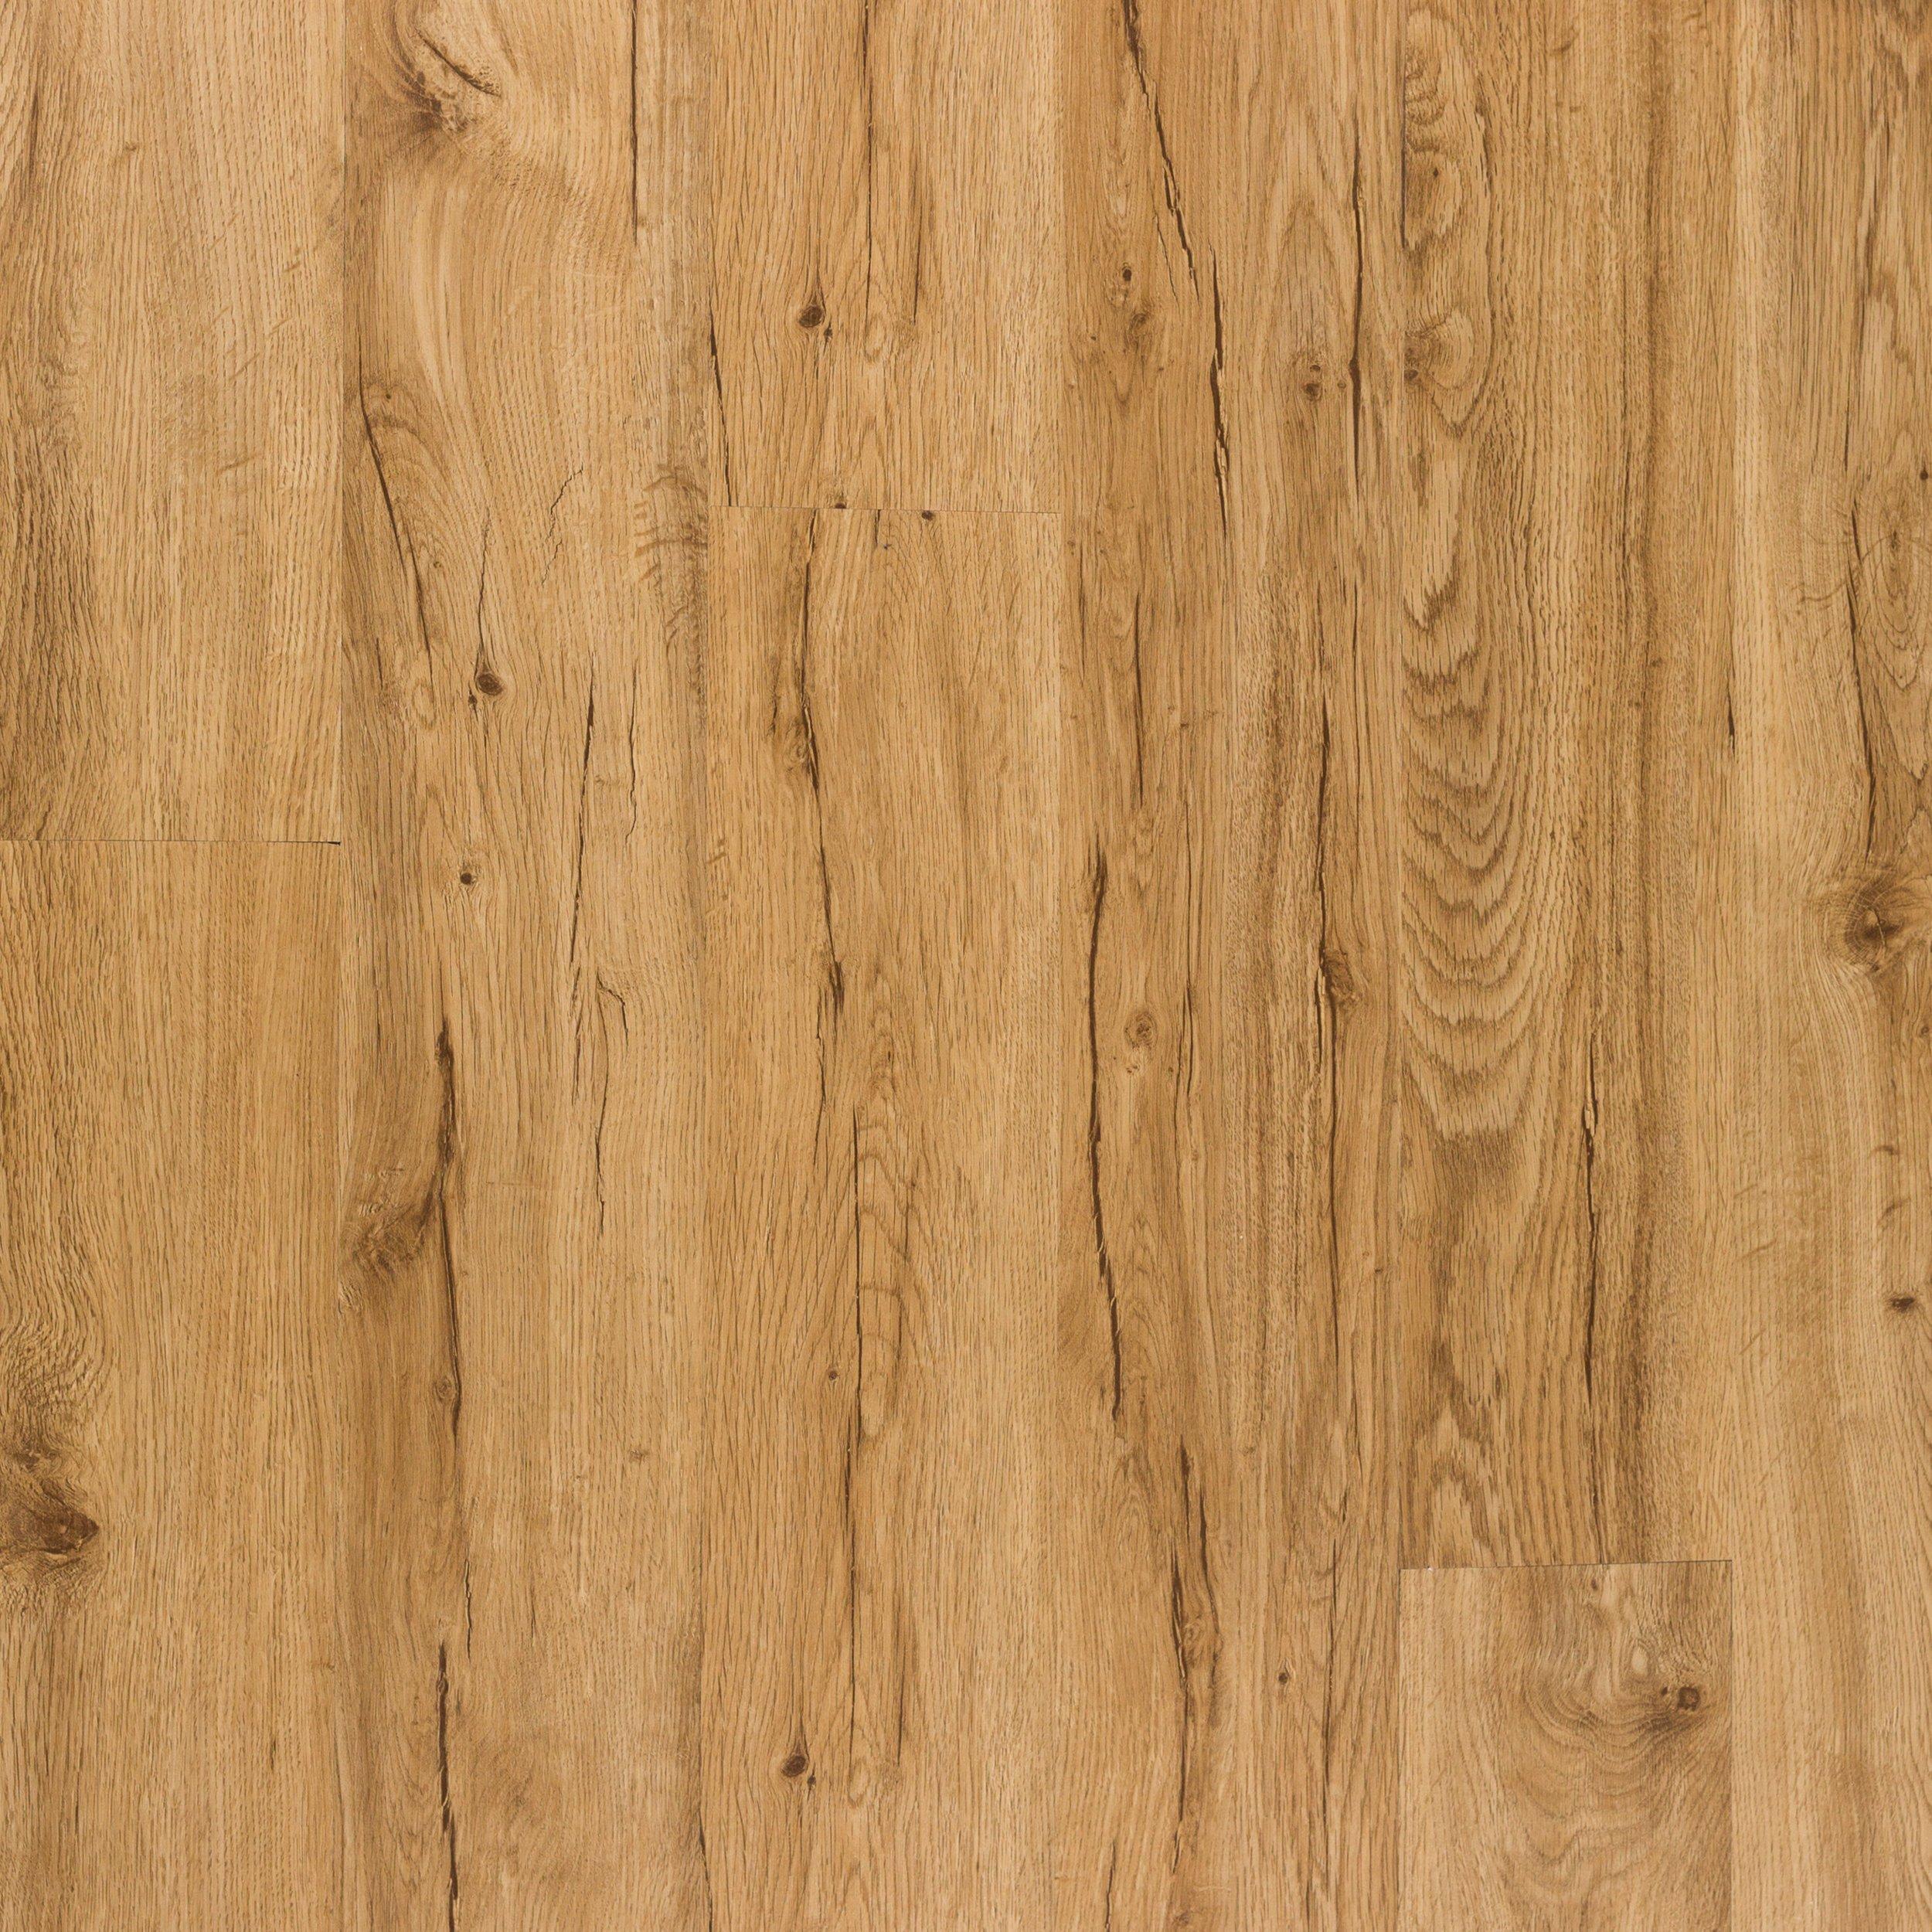 Vinyl planks peel and stick wood floor vinyl plank for Casa moderna vinyl flooring